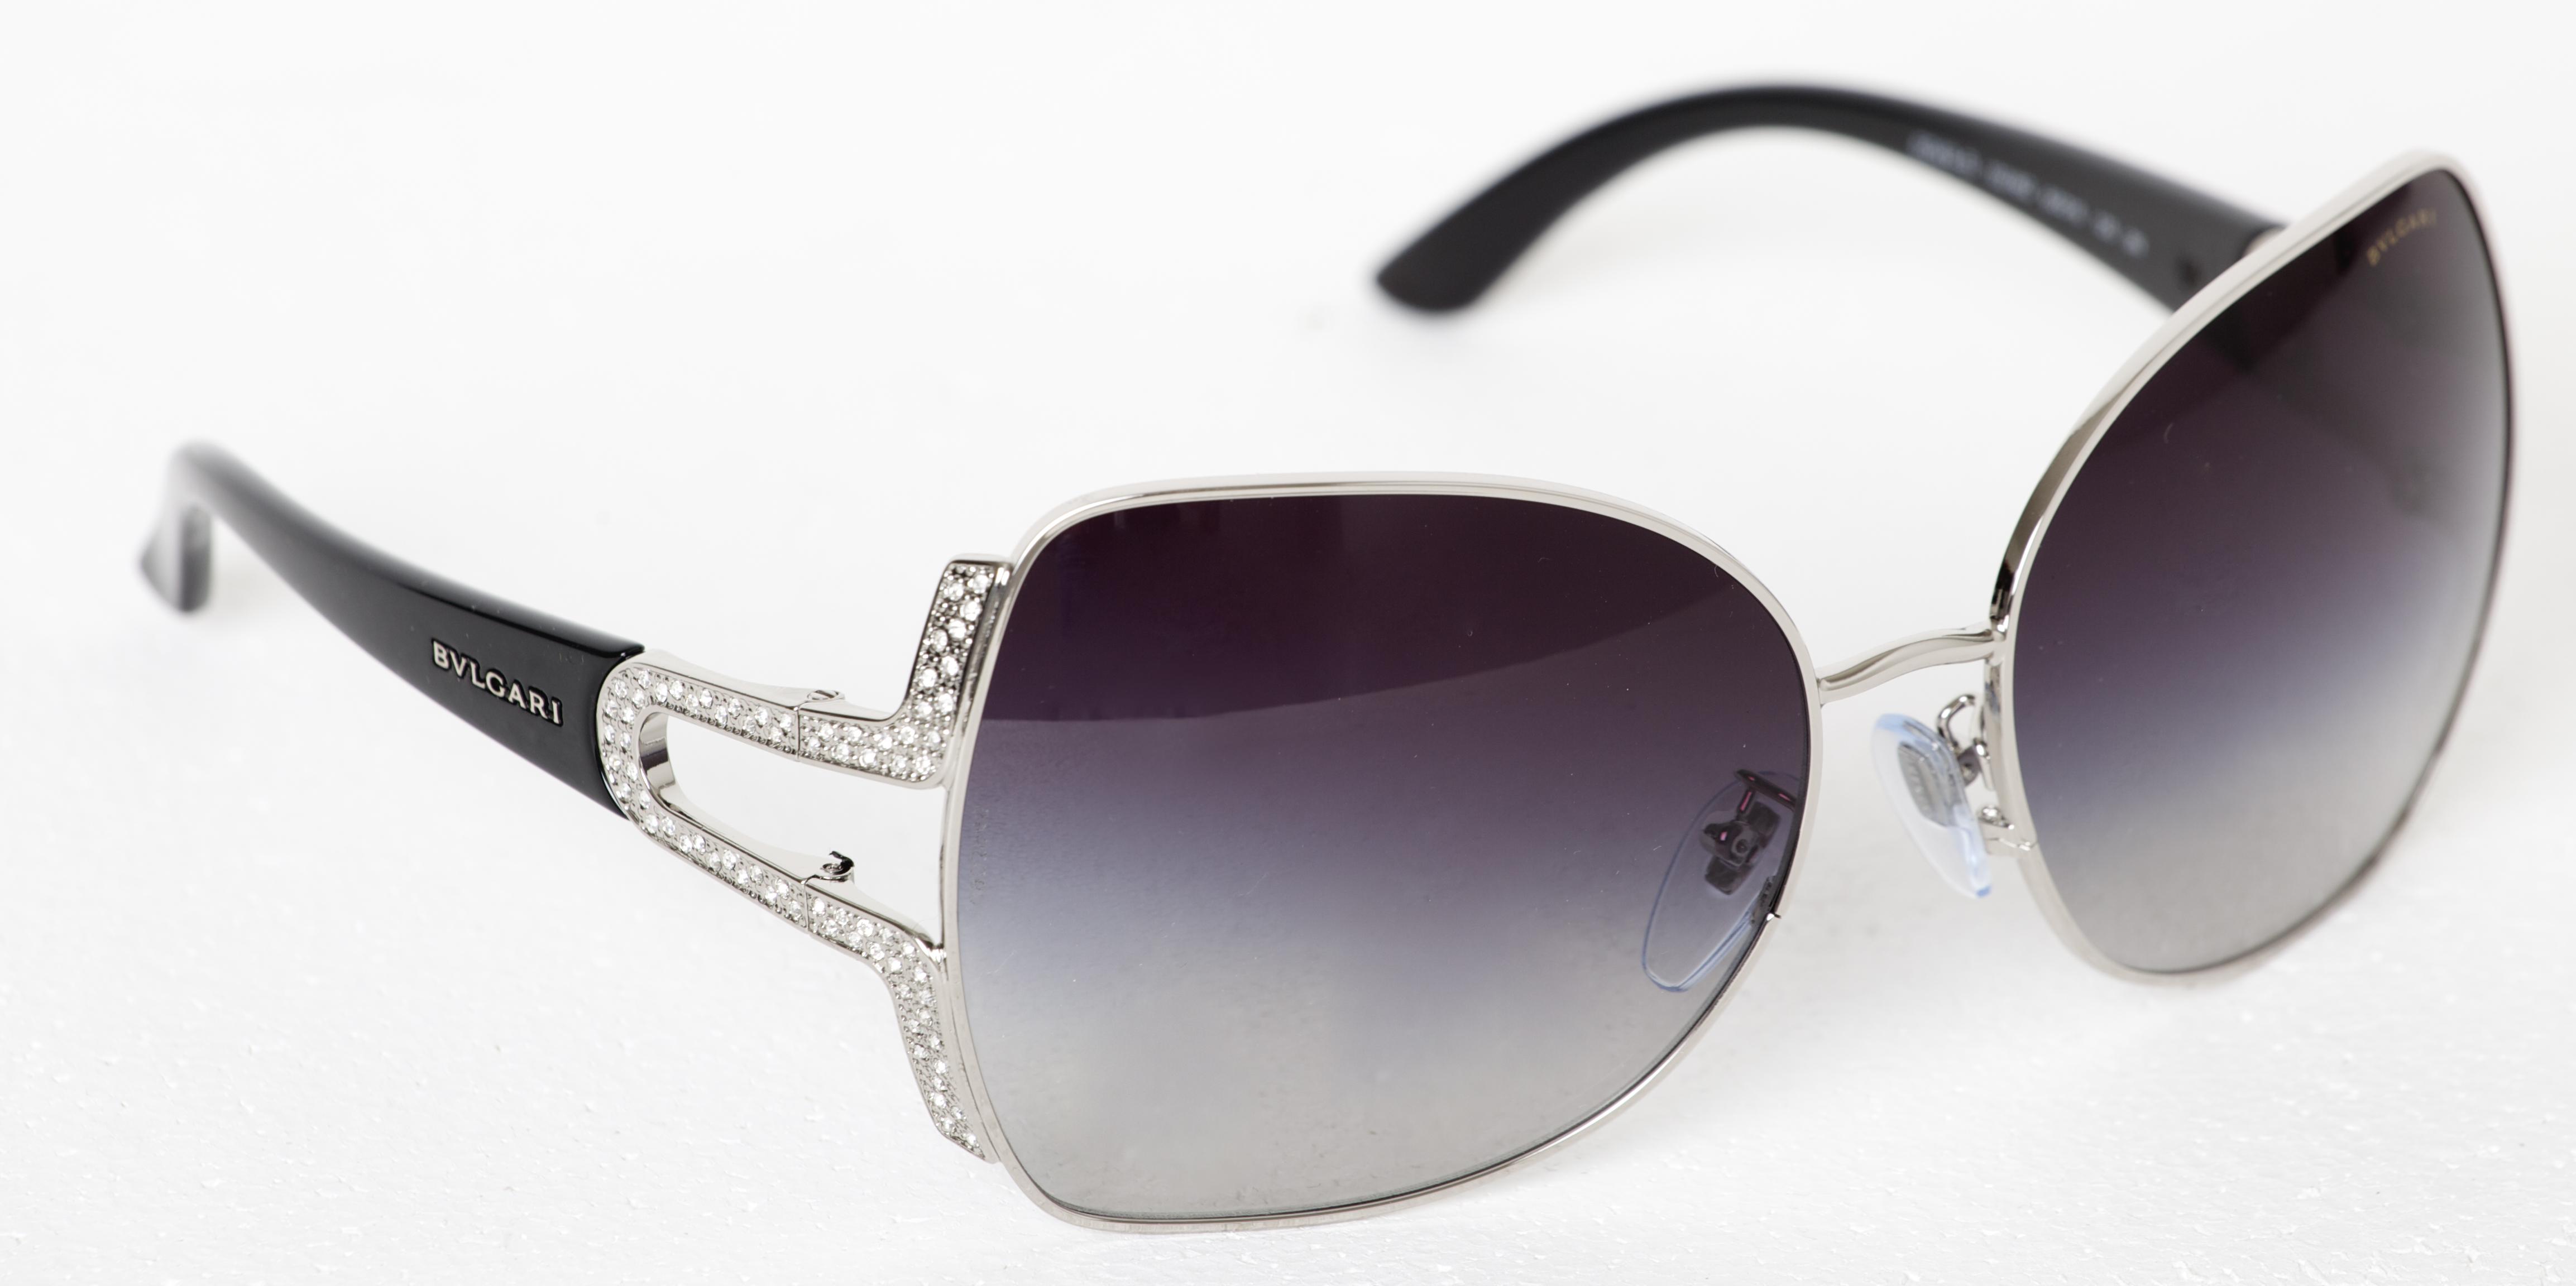 Put them on – Trendy sunglasses this season